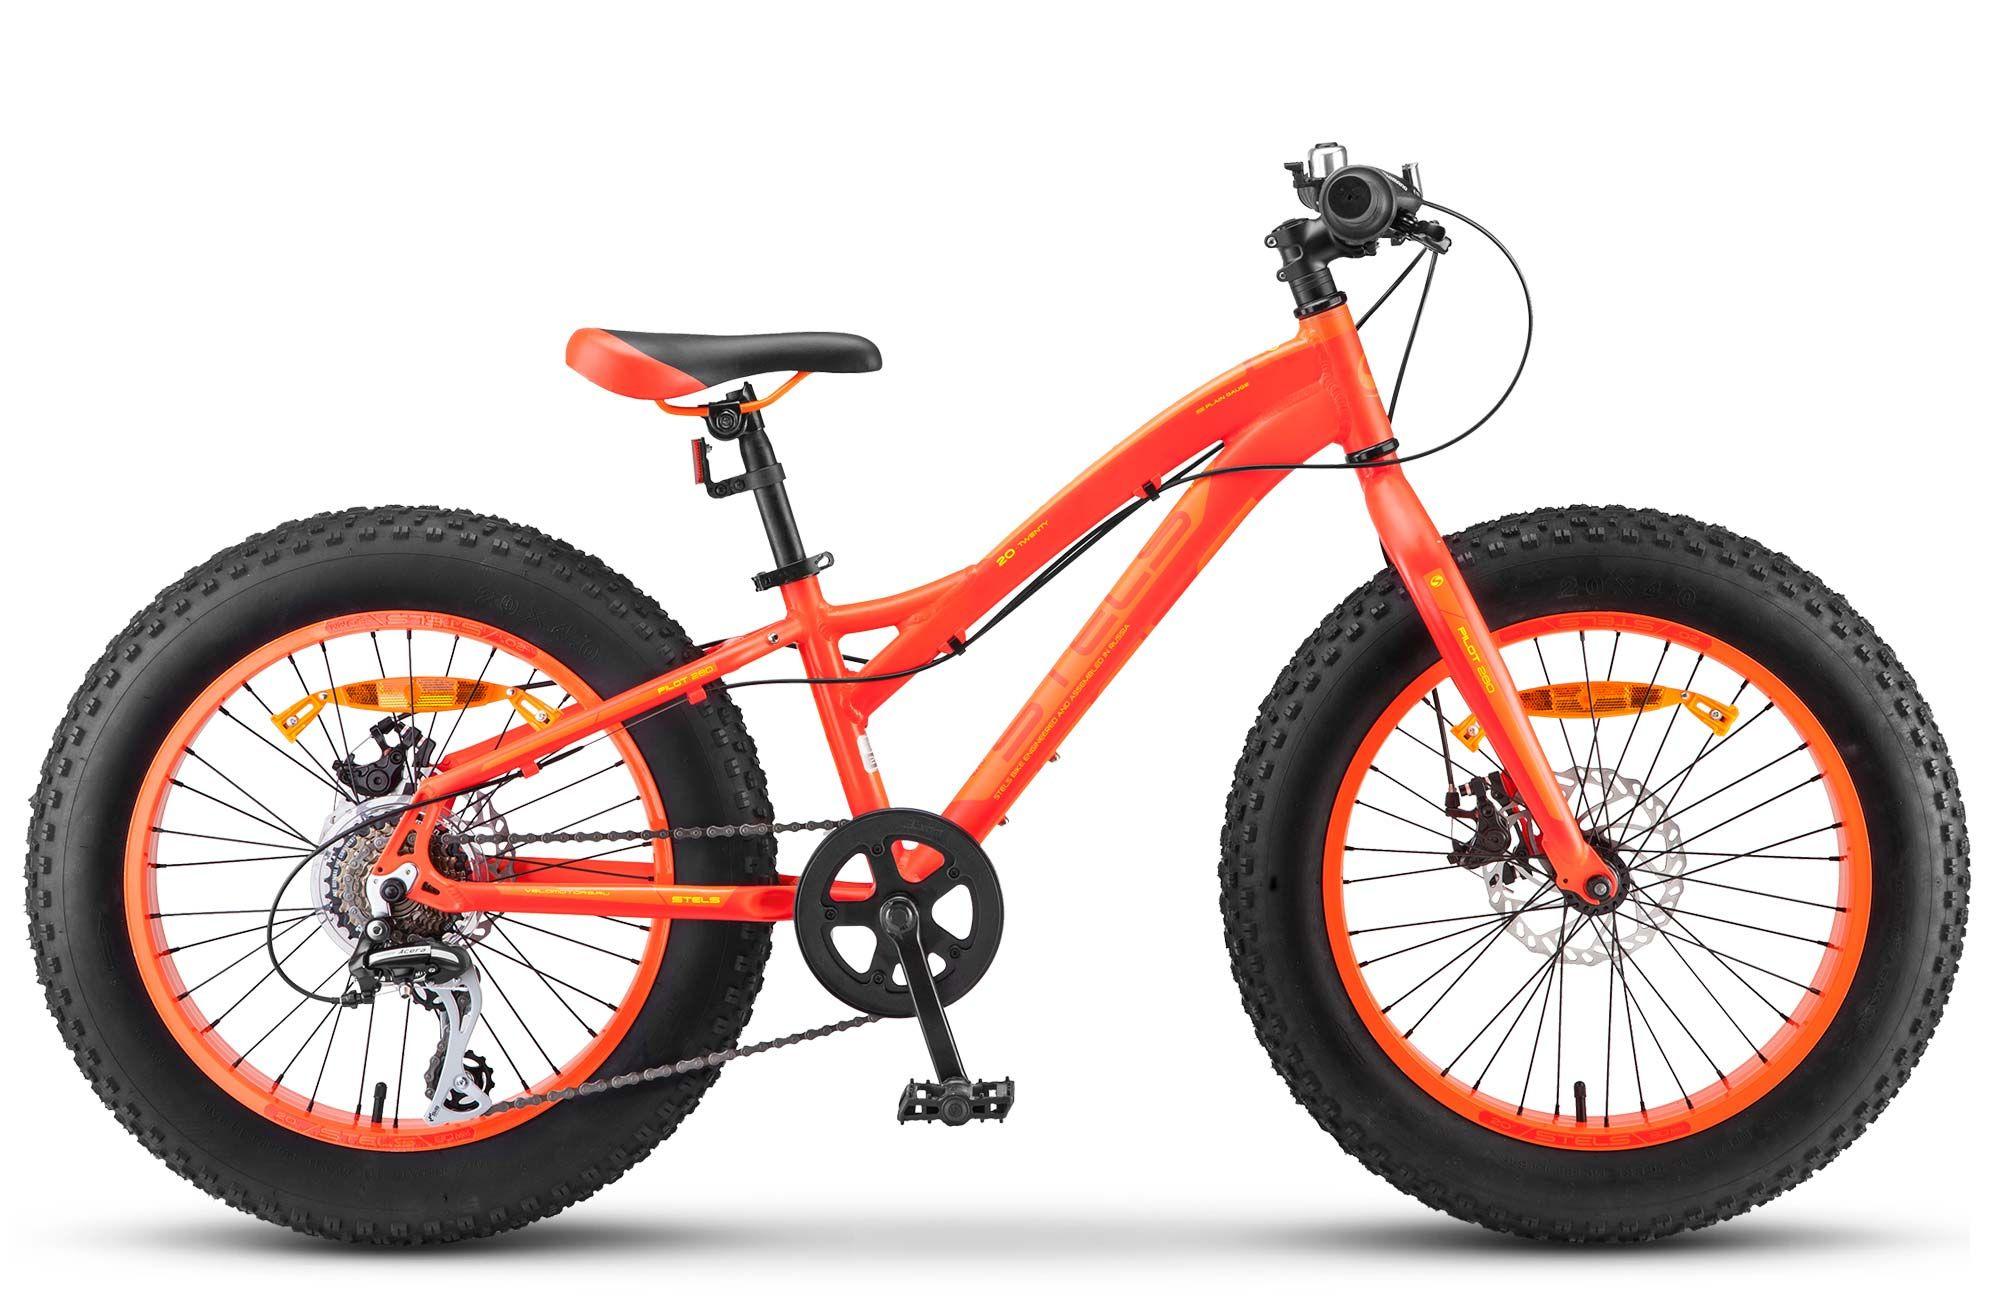 Велосипед Stels Pilot 280 MD 20 (V020) 2018 велосипед stels powerkid 12 boy v020 2018